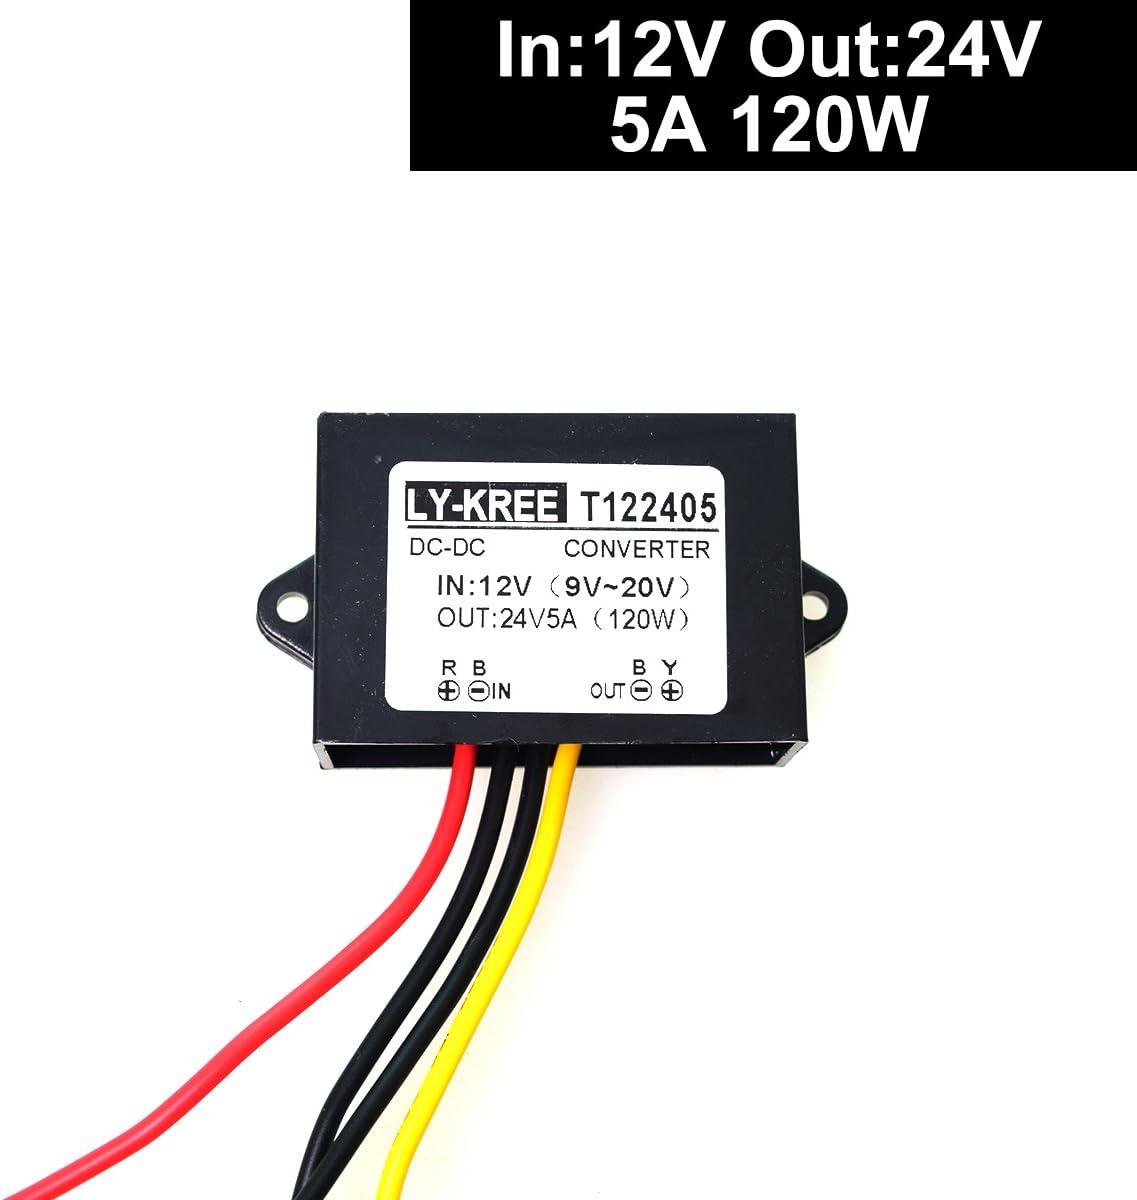 DC 9-20V 12v Step up to 24v Converter Regulator 5A 120W Power Supply Adapter